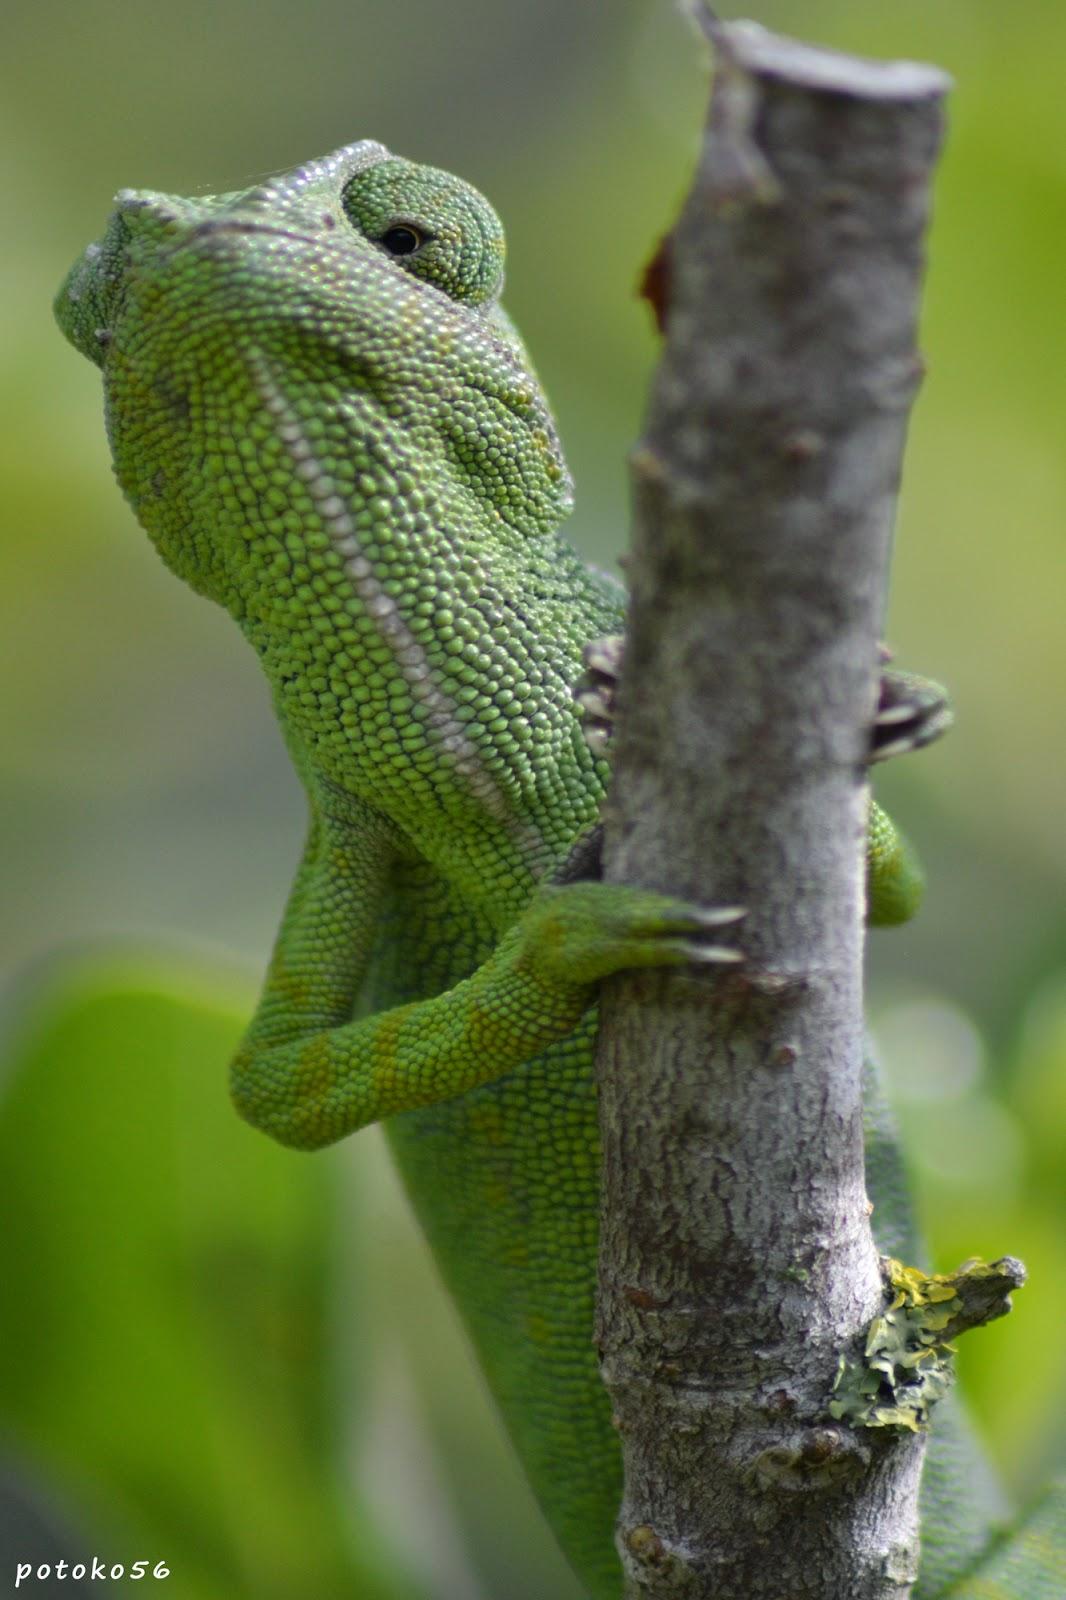 Un Camaleón Roteño Jardin Botánico